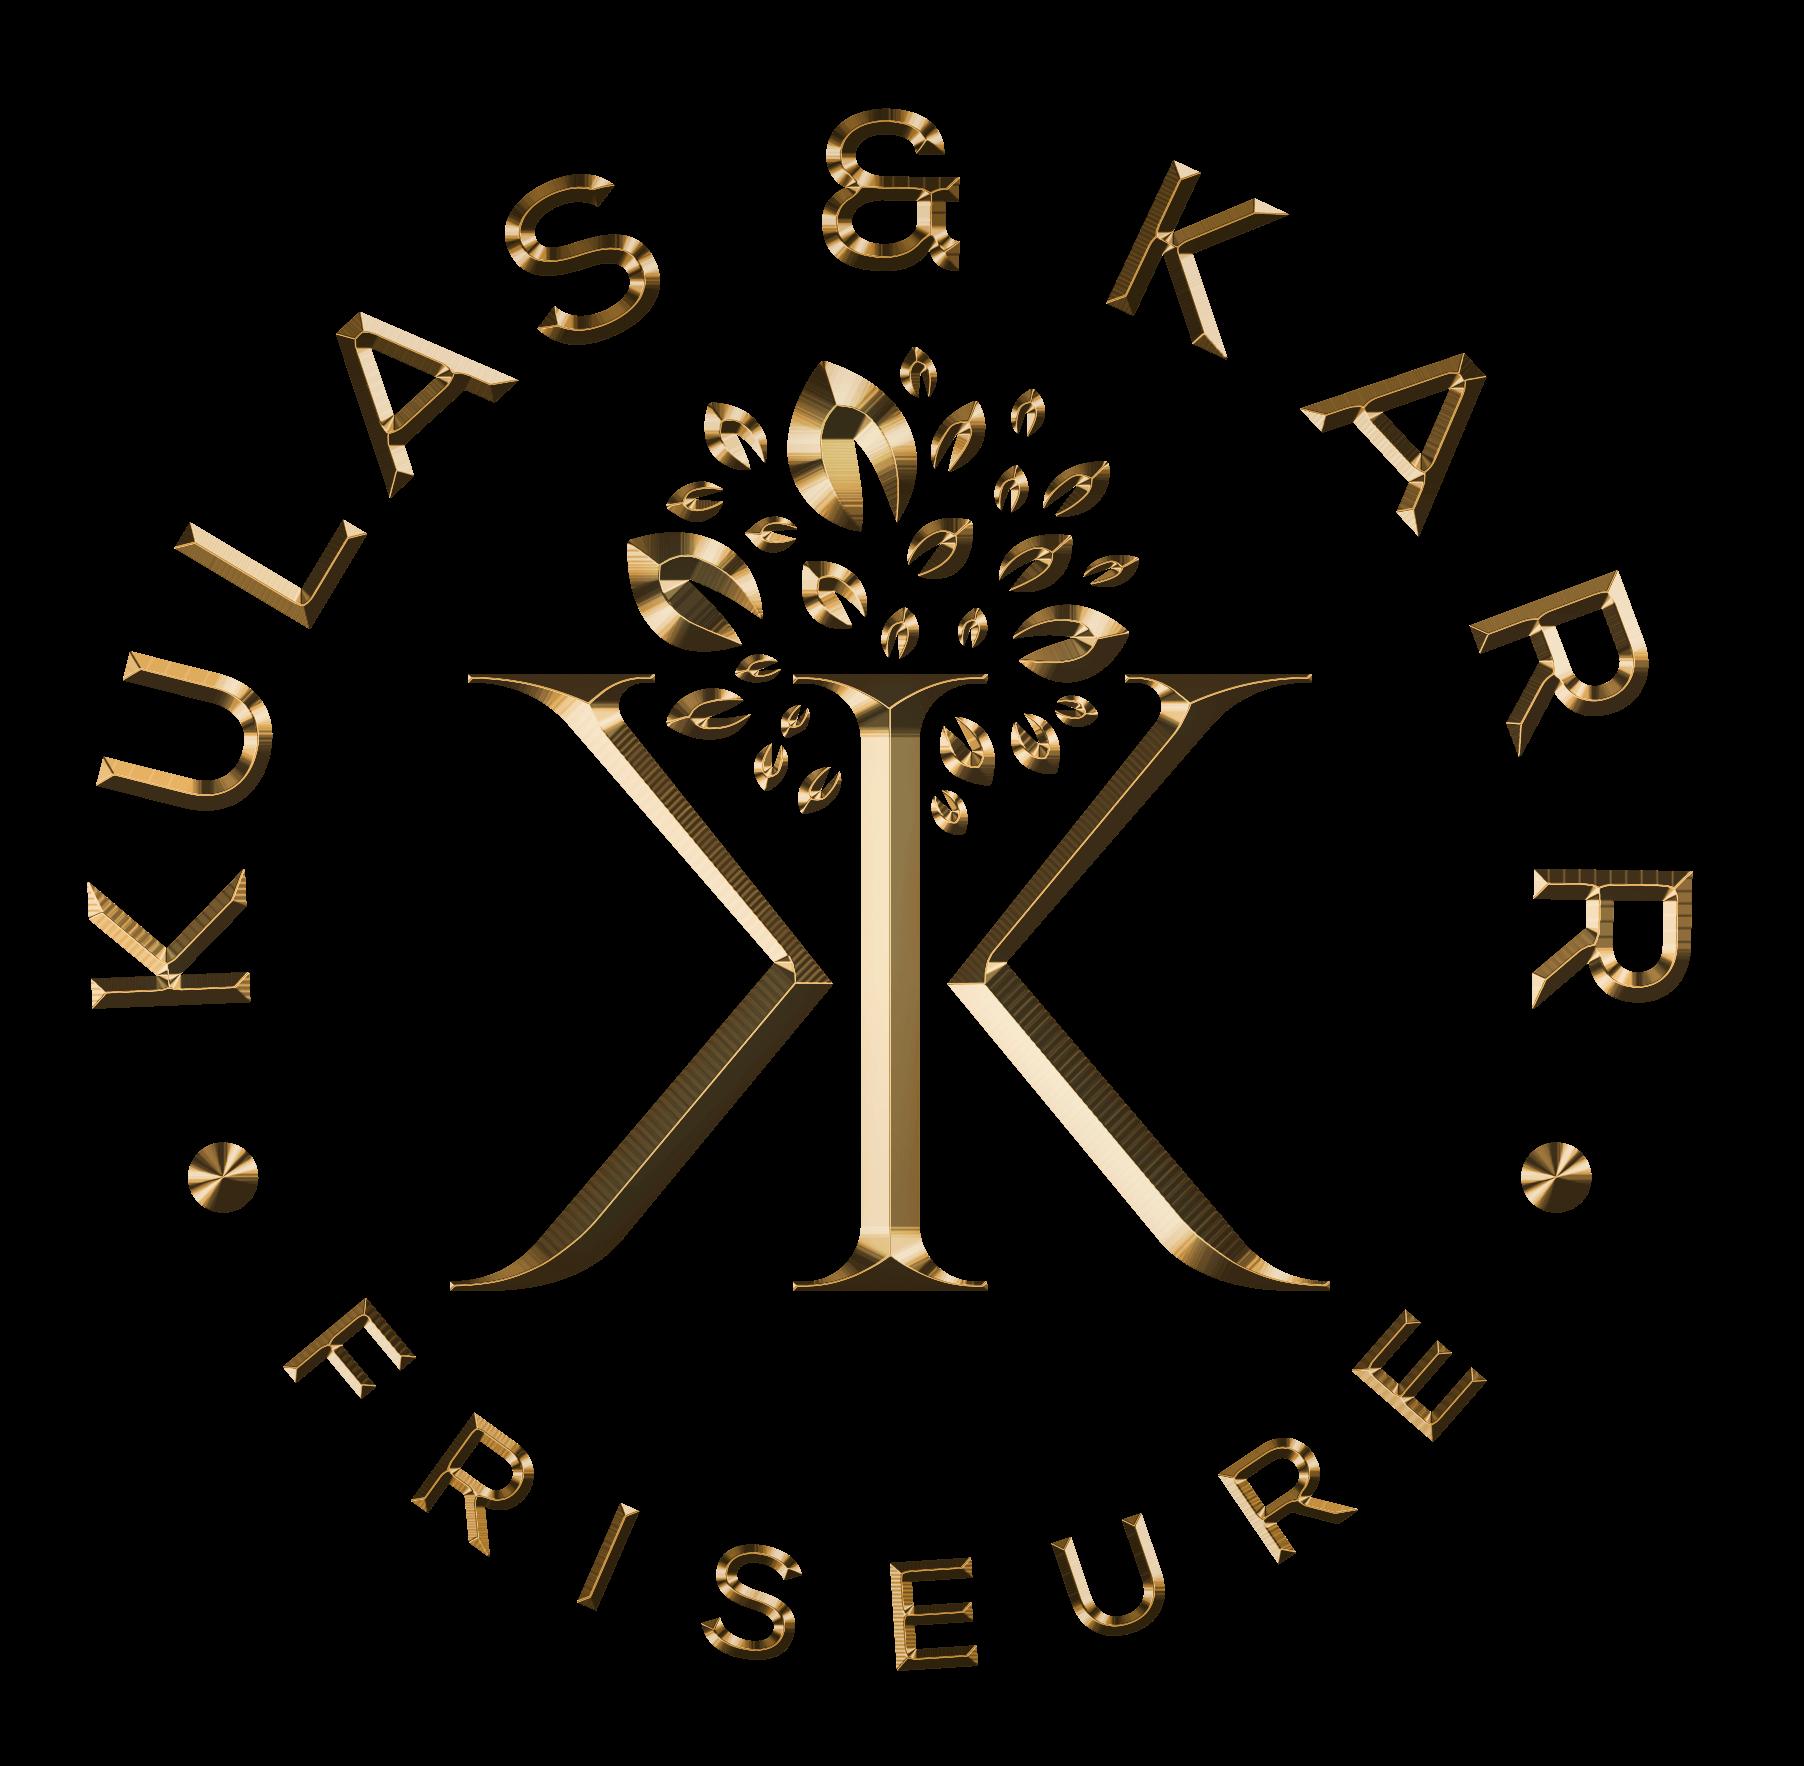 Logo Kulas & Karr Friseure